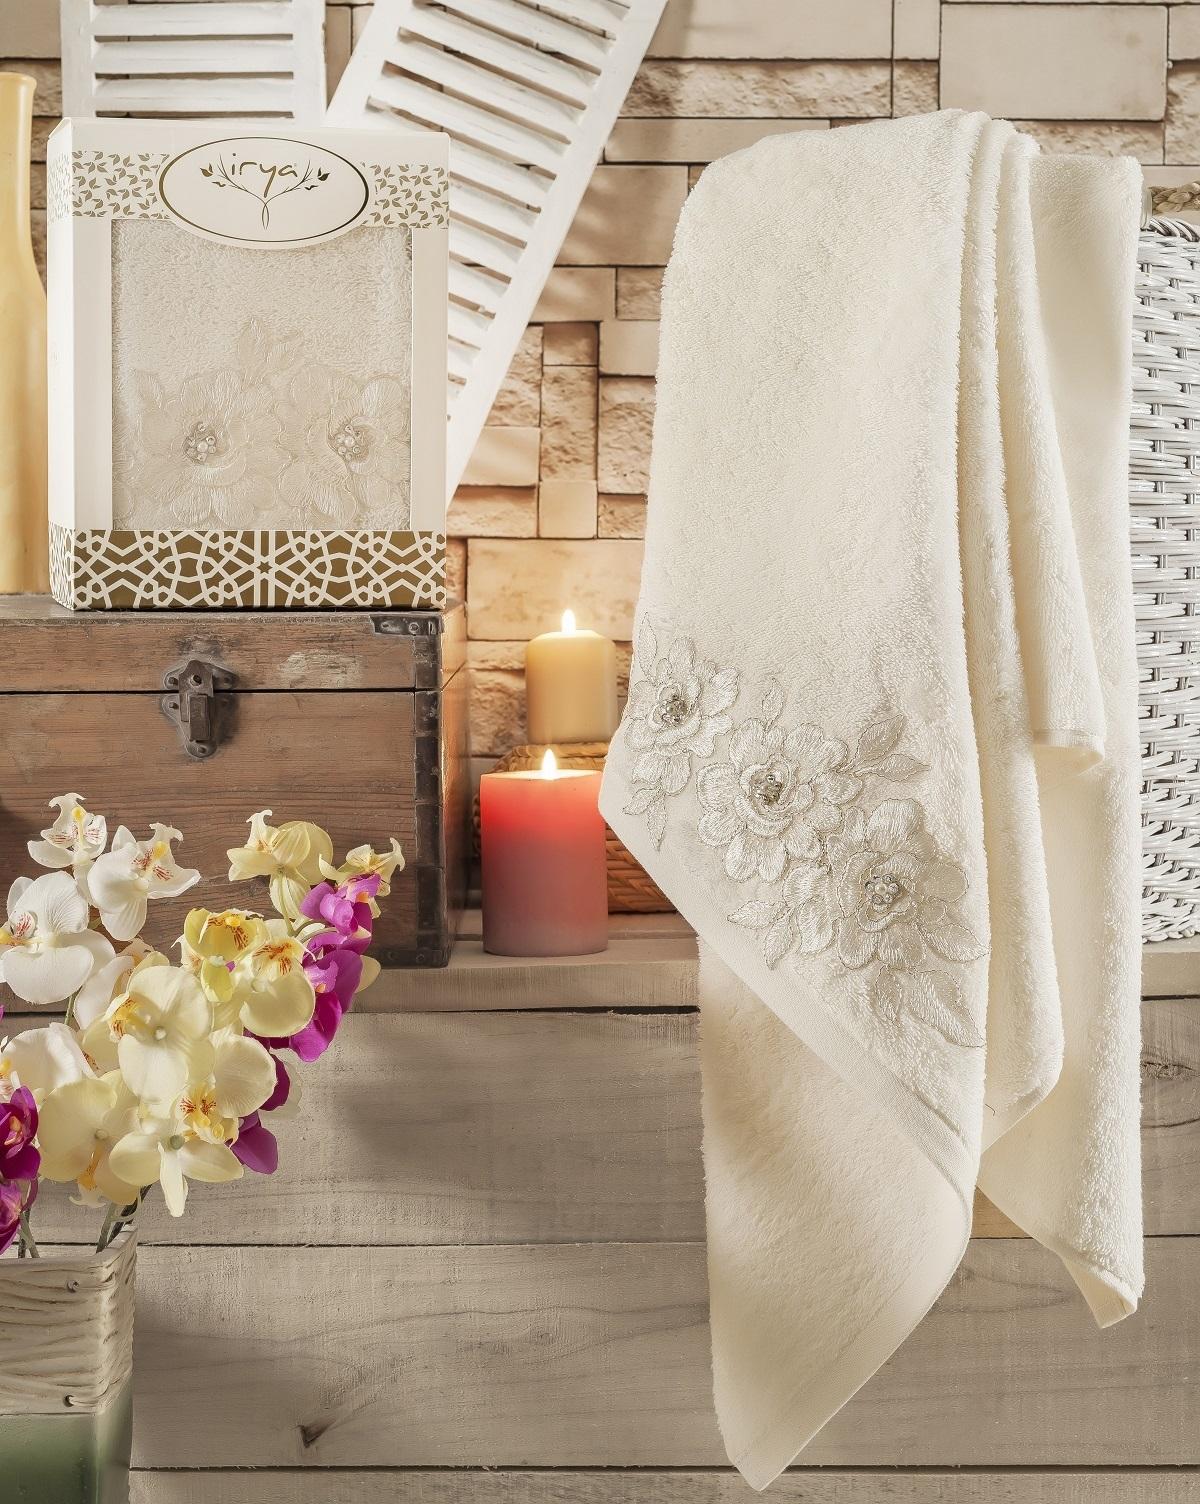 Купить Полотенца IRYA, Полотенце Romantic Цвет: Кремовый (85х150 см), Турция, Махра